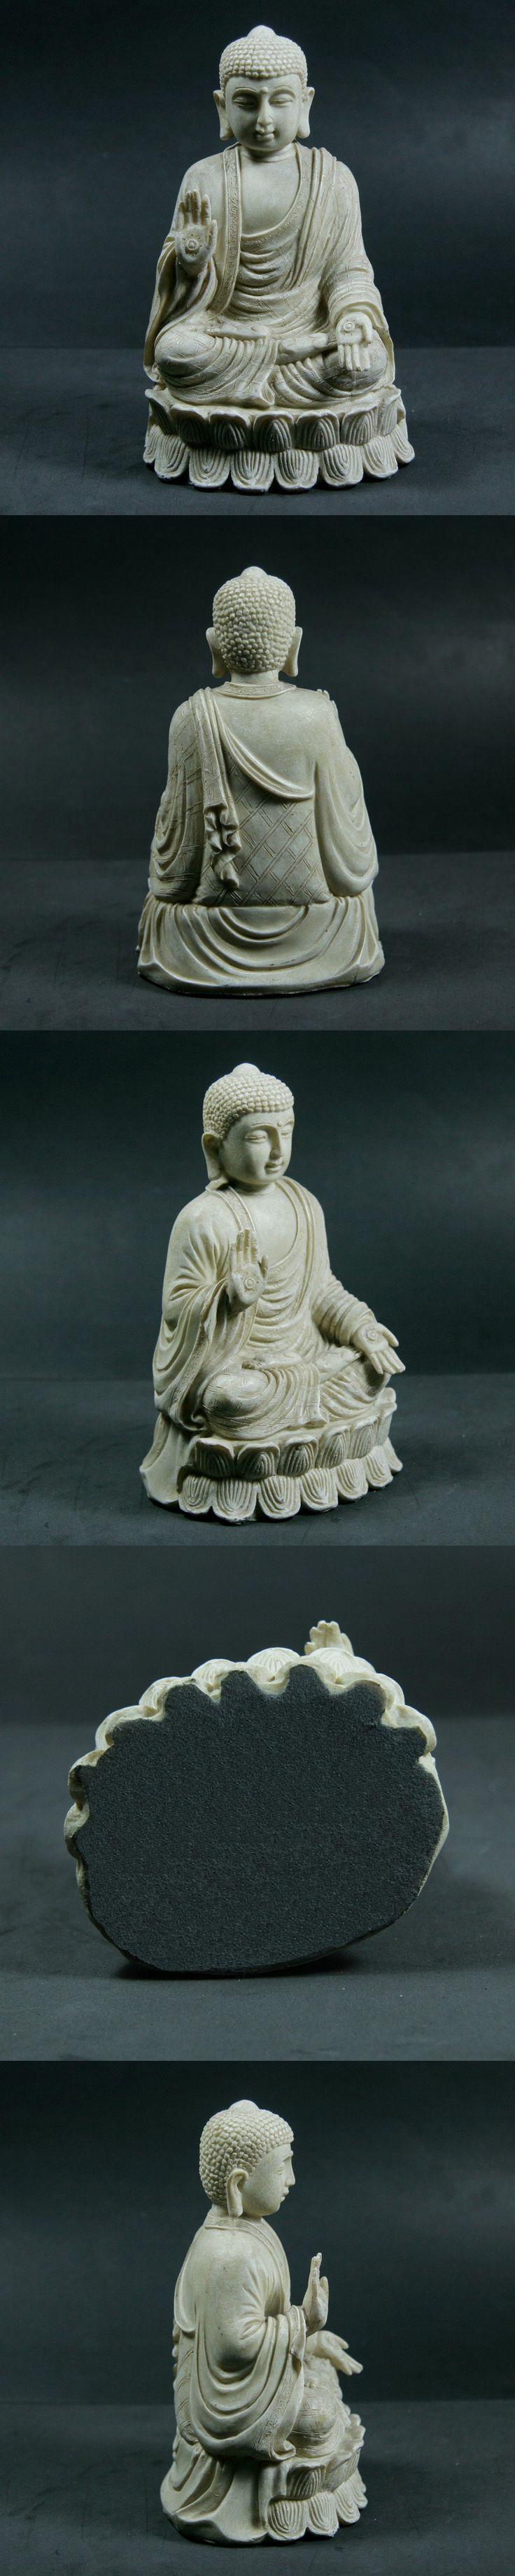 Resin ornaments, buddha statue, Buddhist supplies, Southeast Asian sculpture, Buddhist effigy, crafts, buddhism figure, figurine $46.49